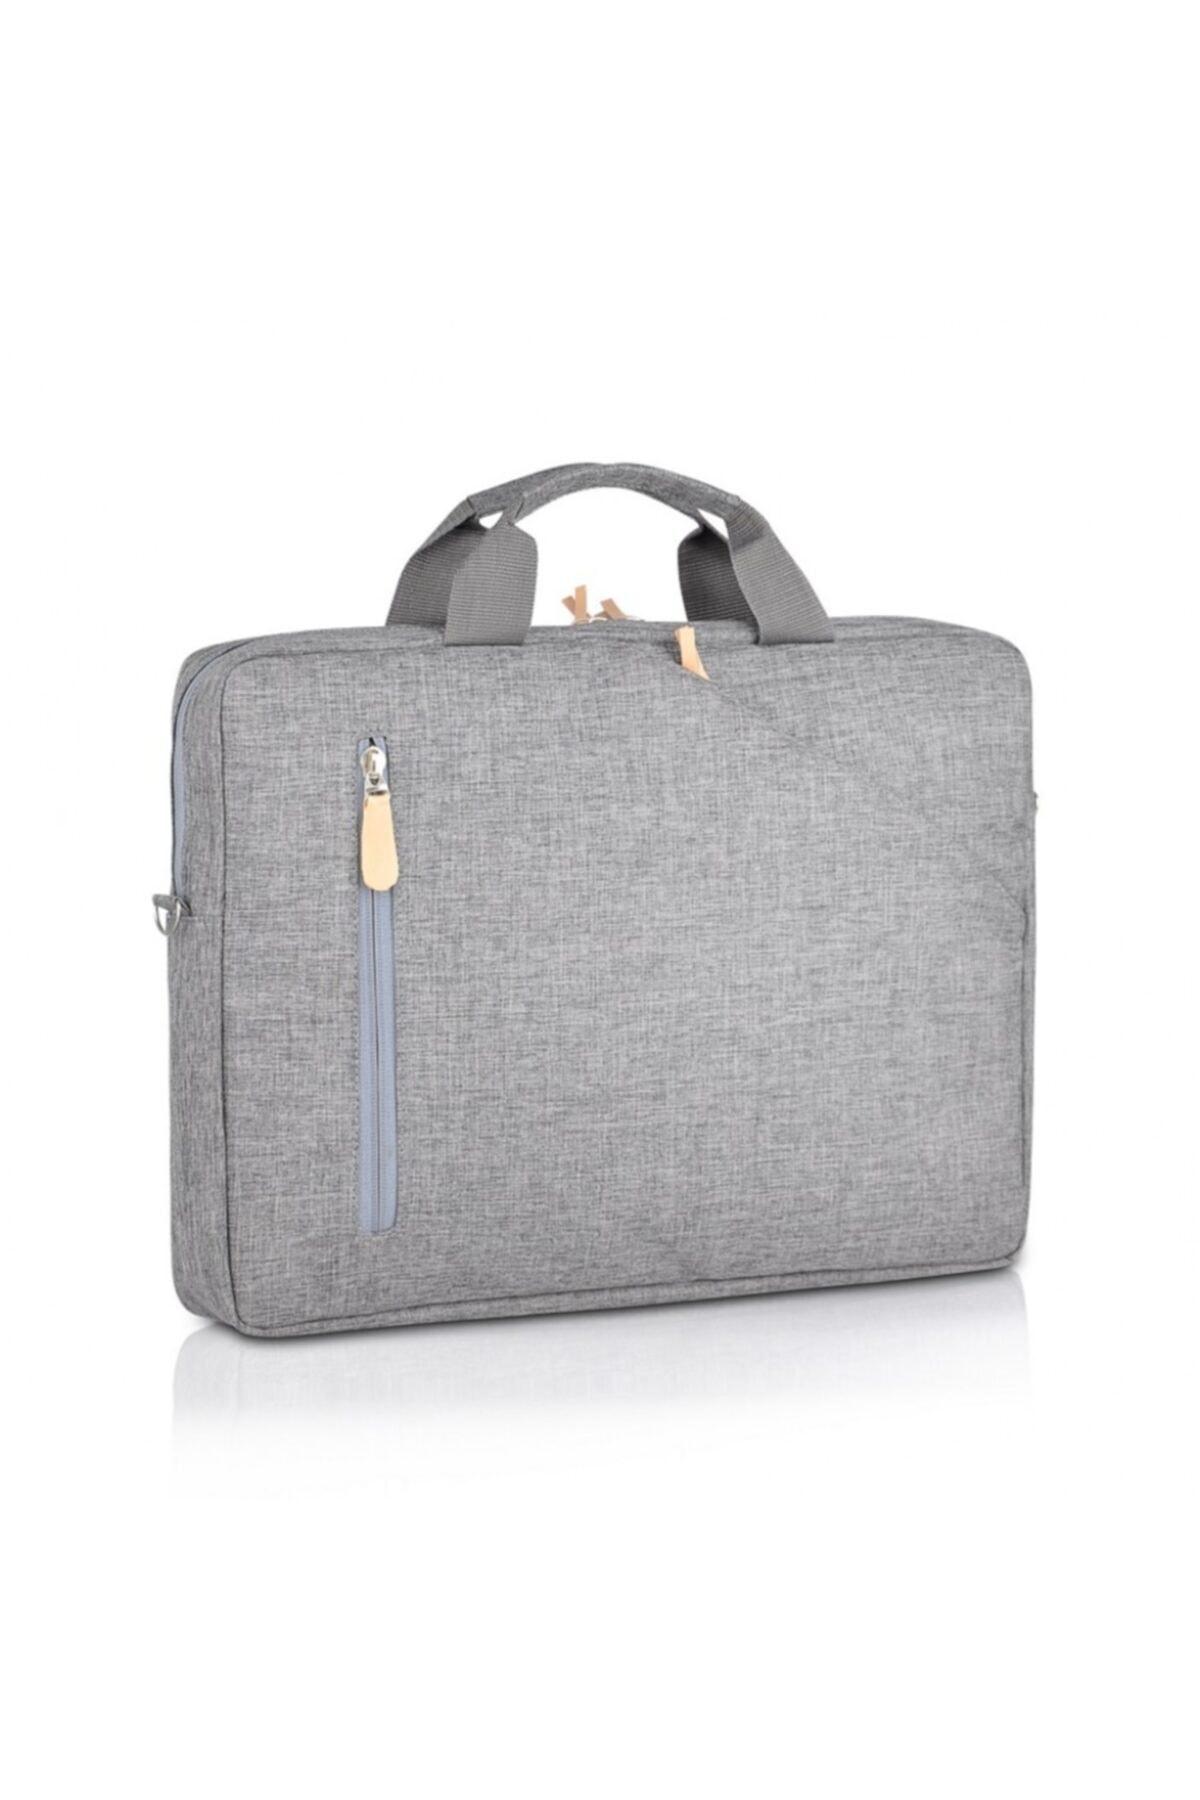 Nar Çanta Laptop / Evrak Çantası Nc-lt-003 Gri (15'' Inç) 1